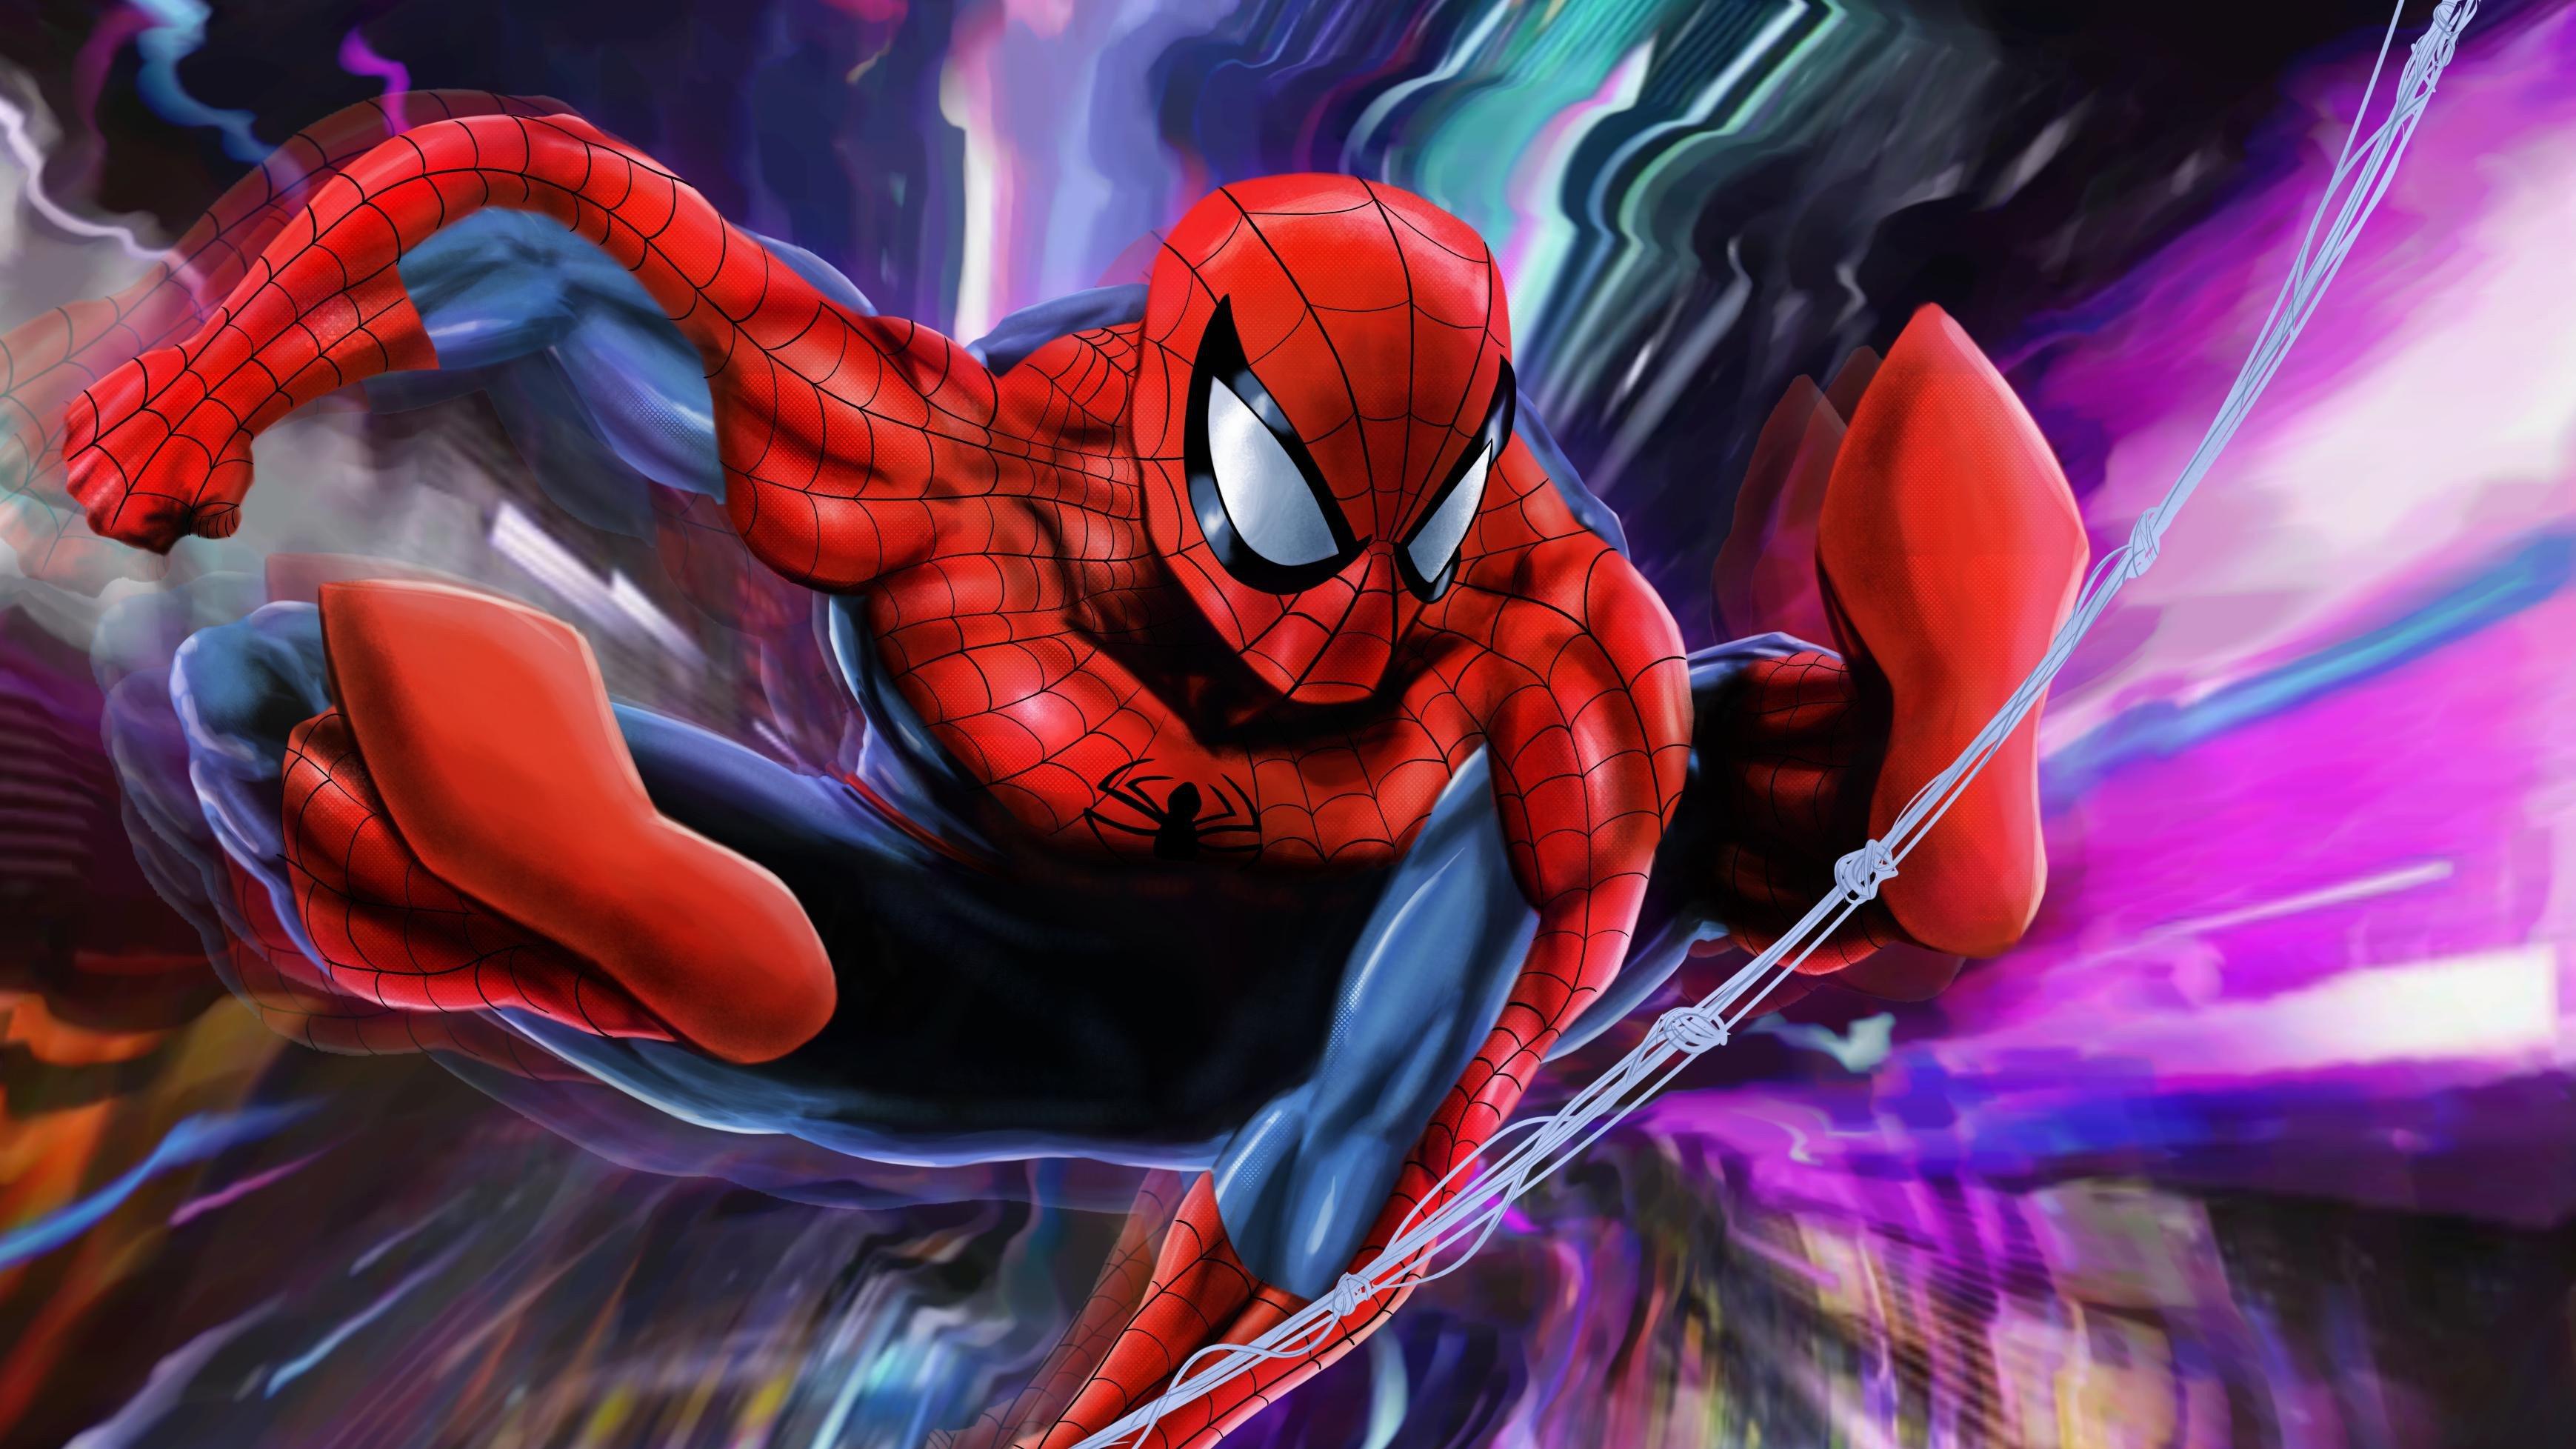 Fondos de pantalla El hombre araña con fondo colorido